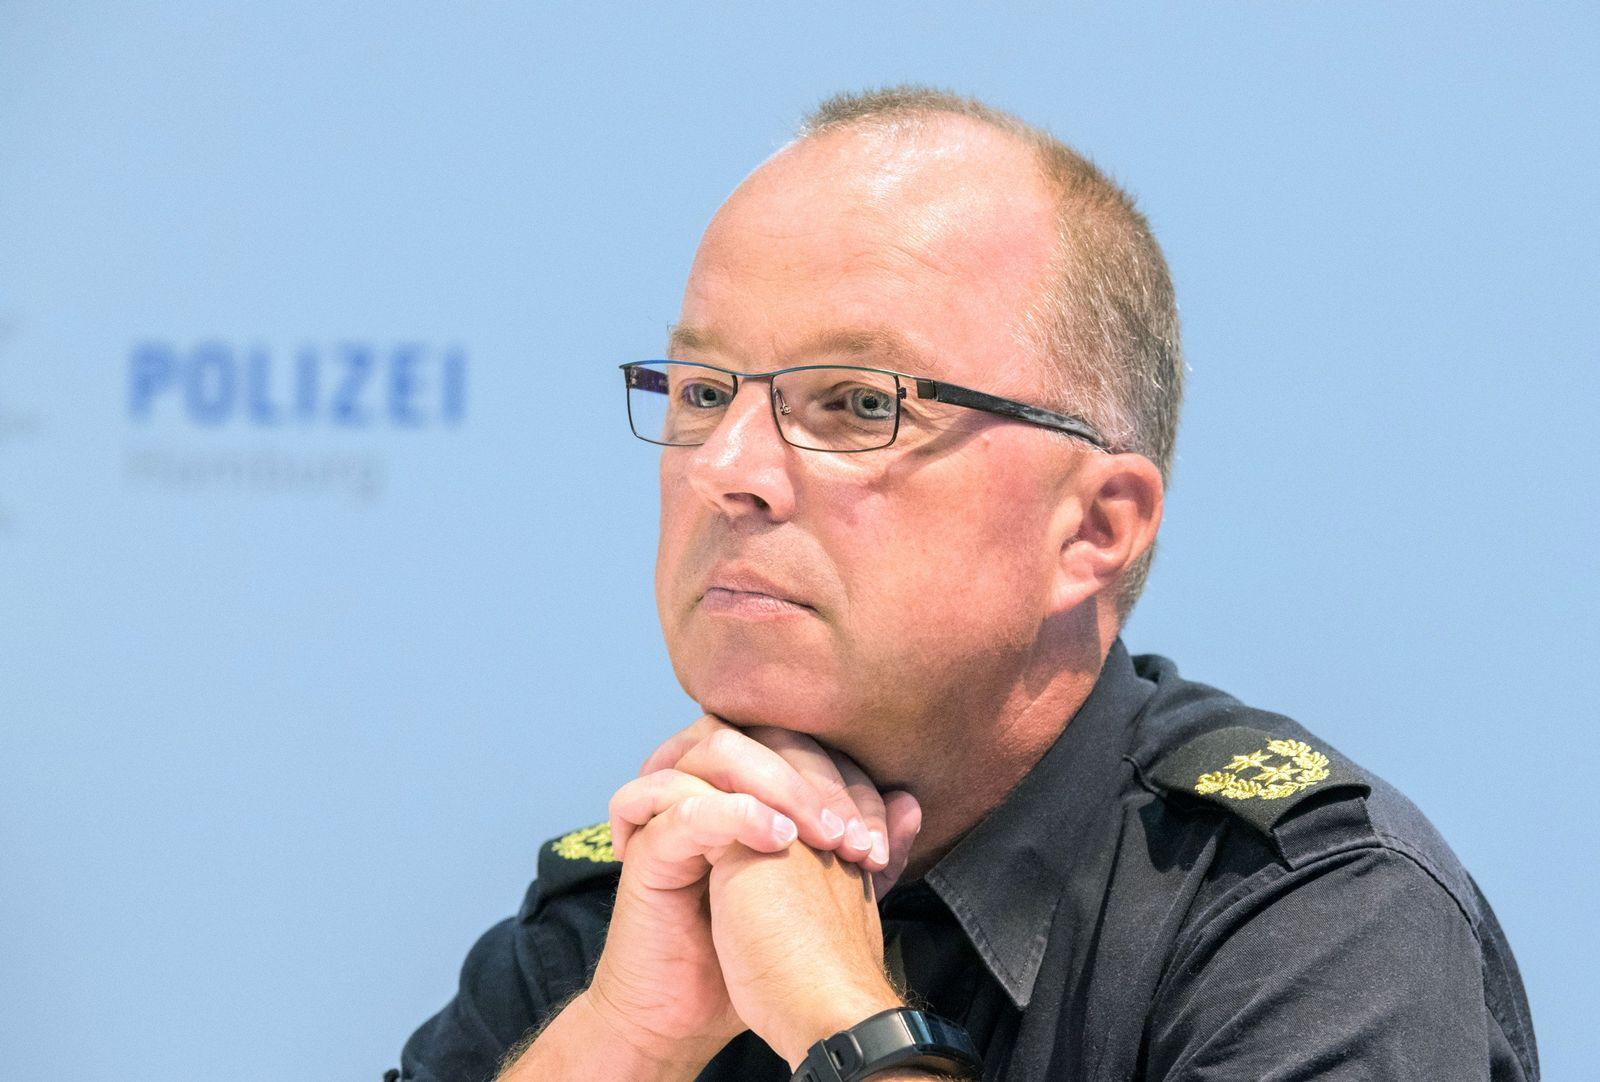 Hamburg/ G20 / Hartmut Dudde